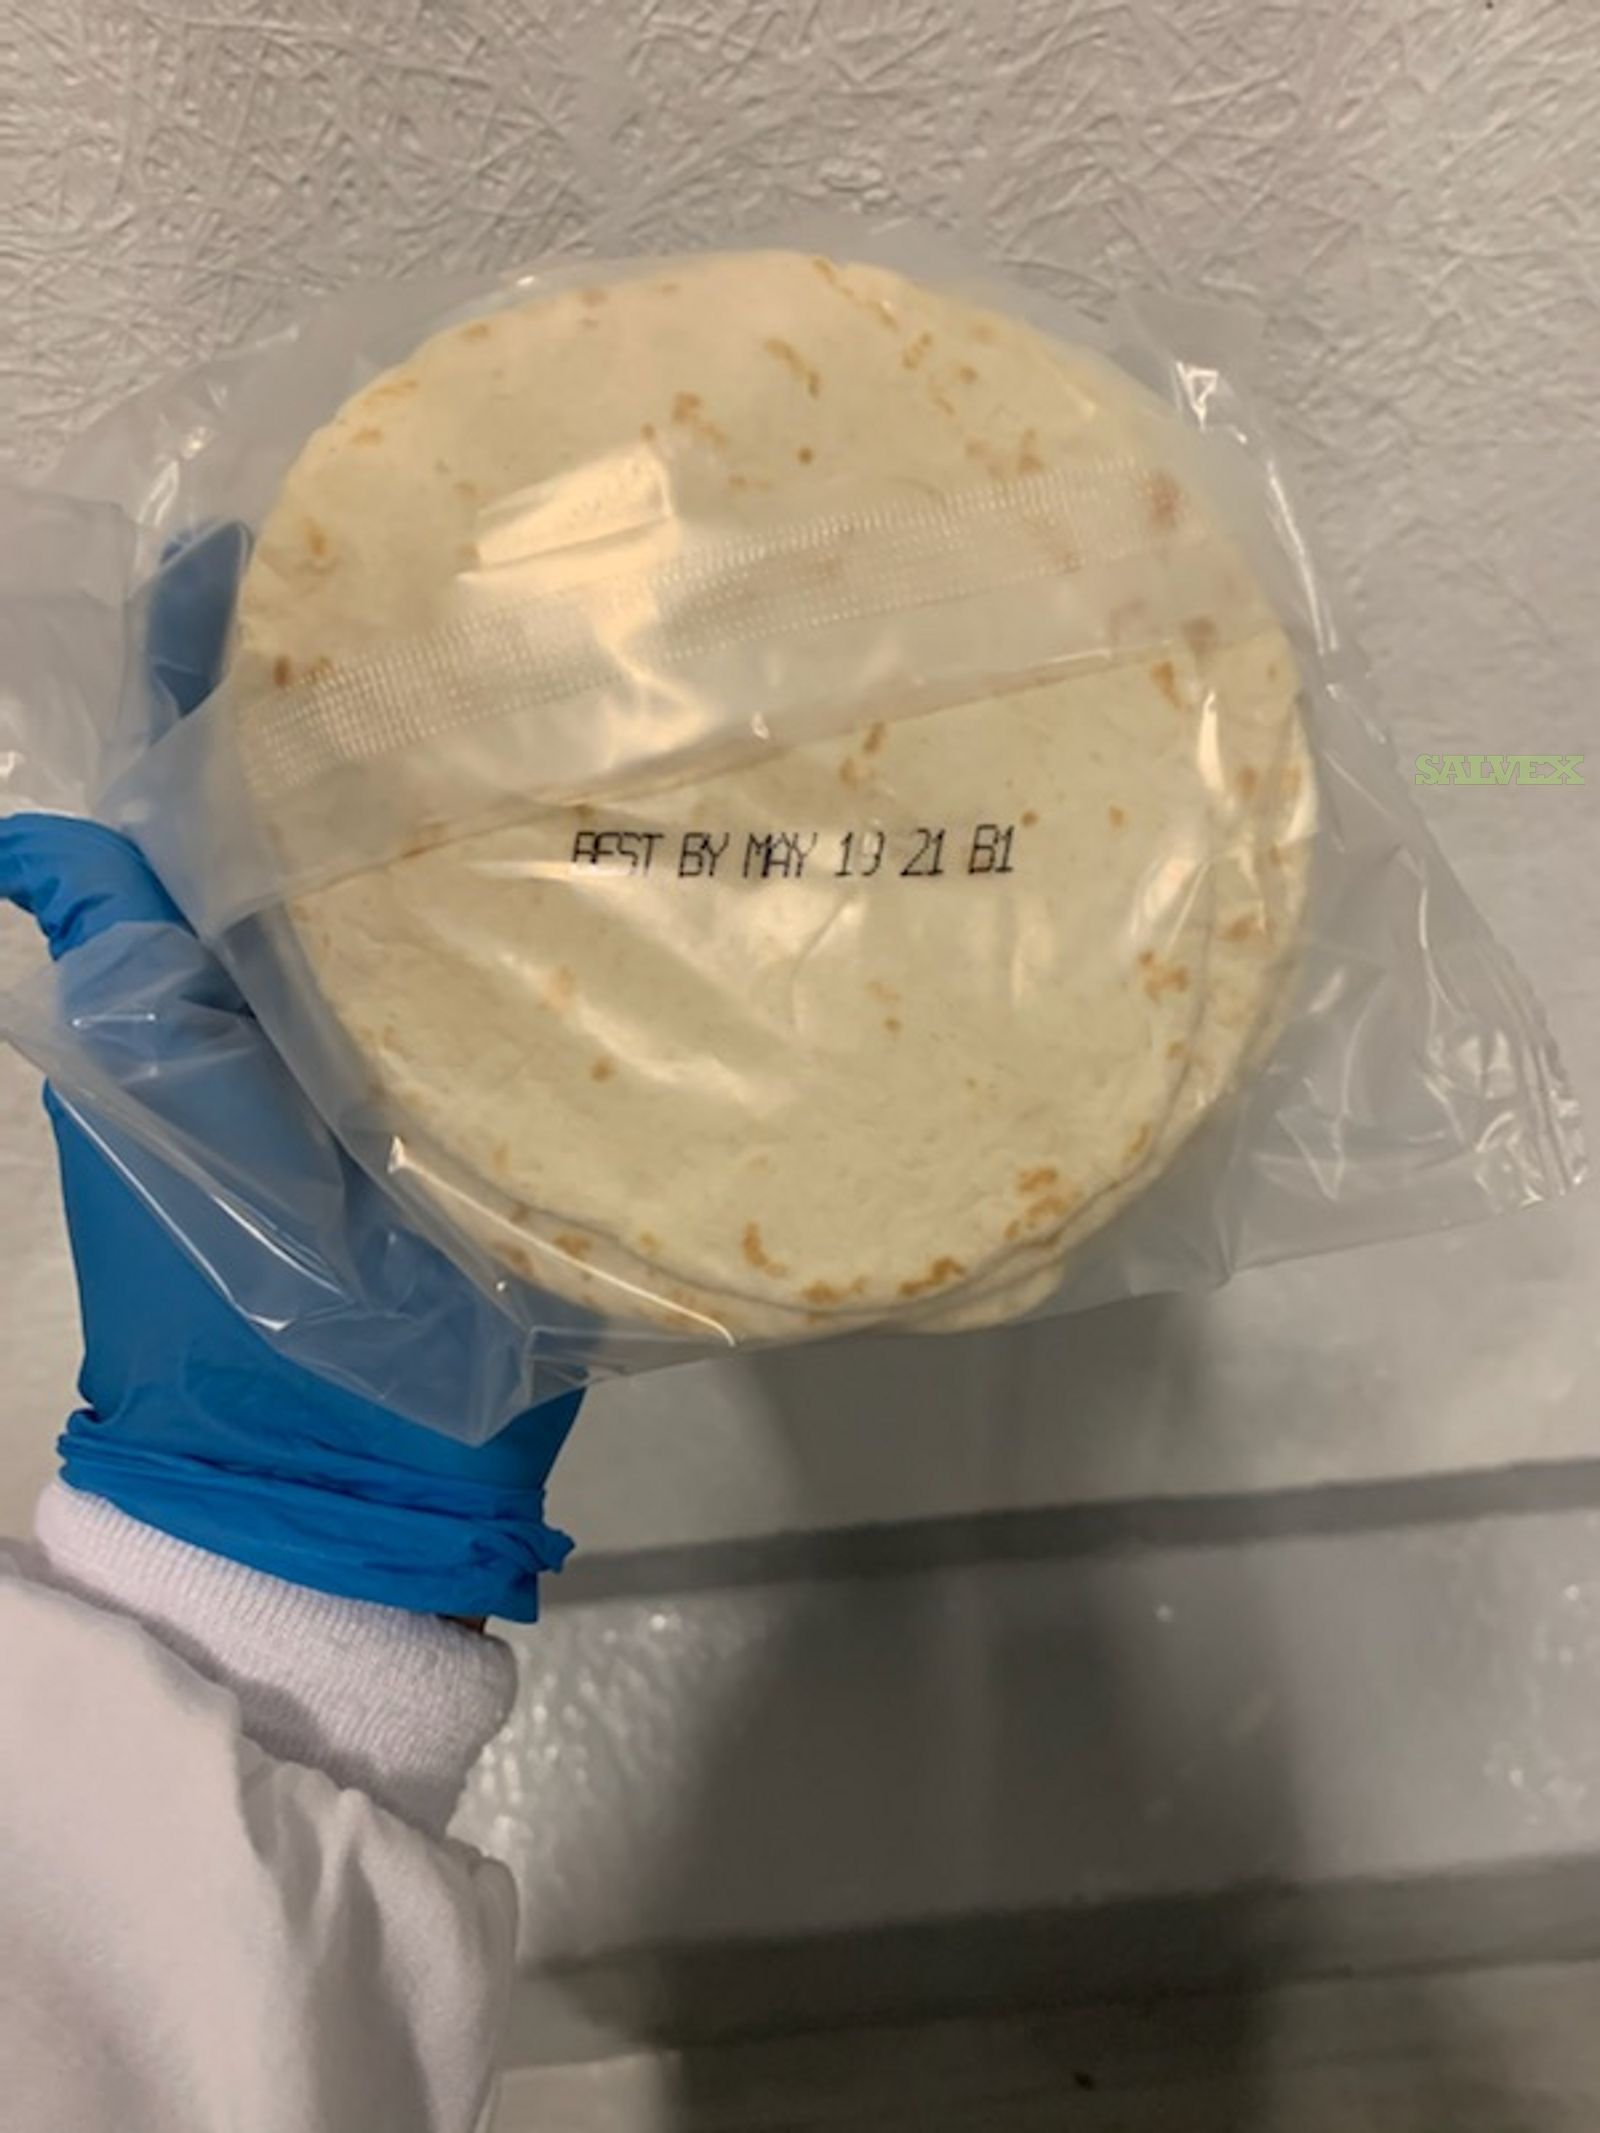 Flour Tortillas, Queso Fresco & Wheat Wraps (1,180 Cases)